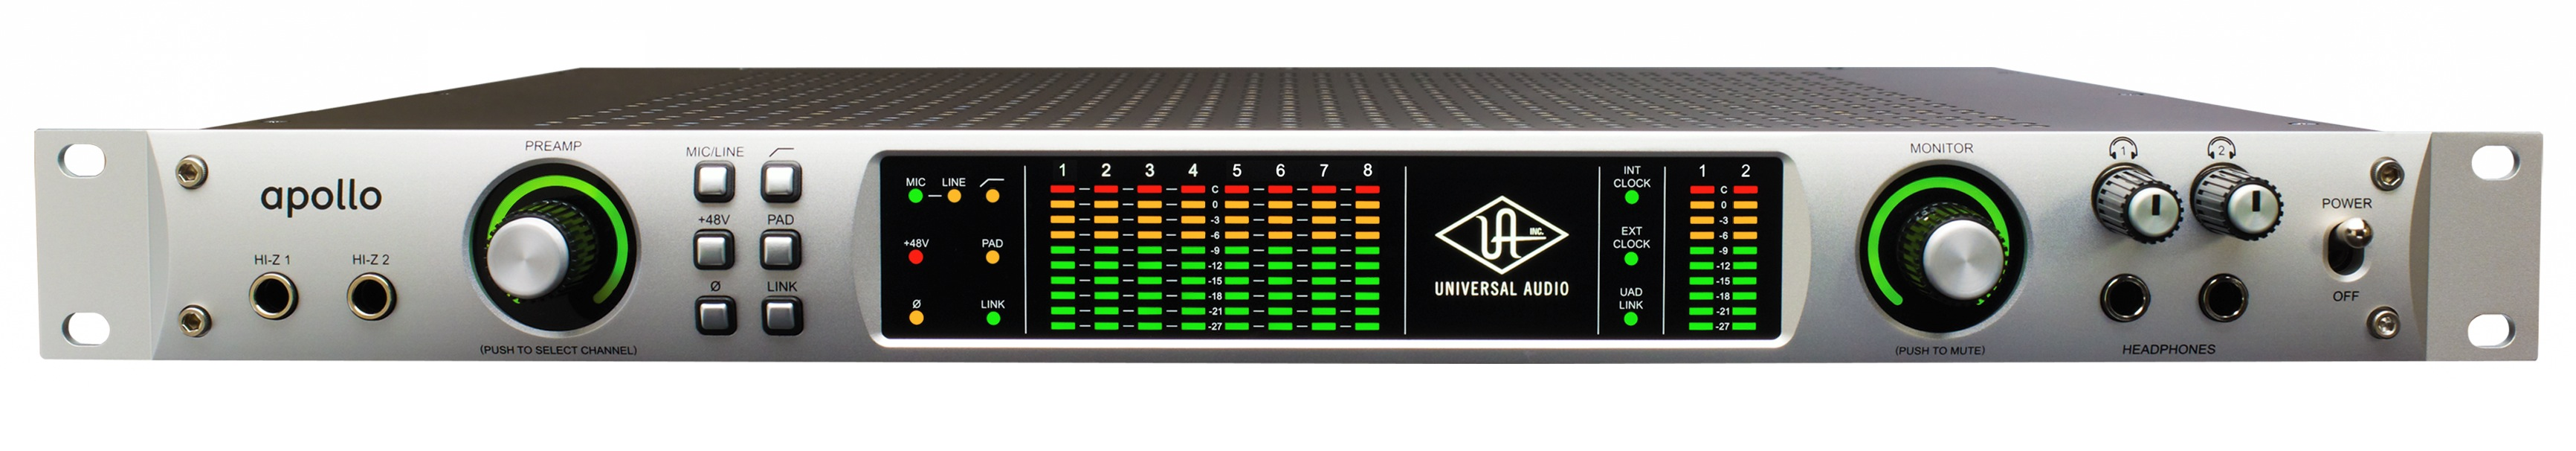 Universal Audio Apollo Duo FireWire Audio Interface with DSP